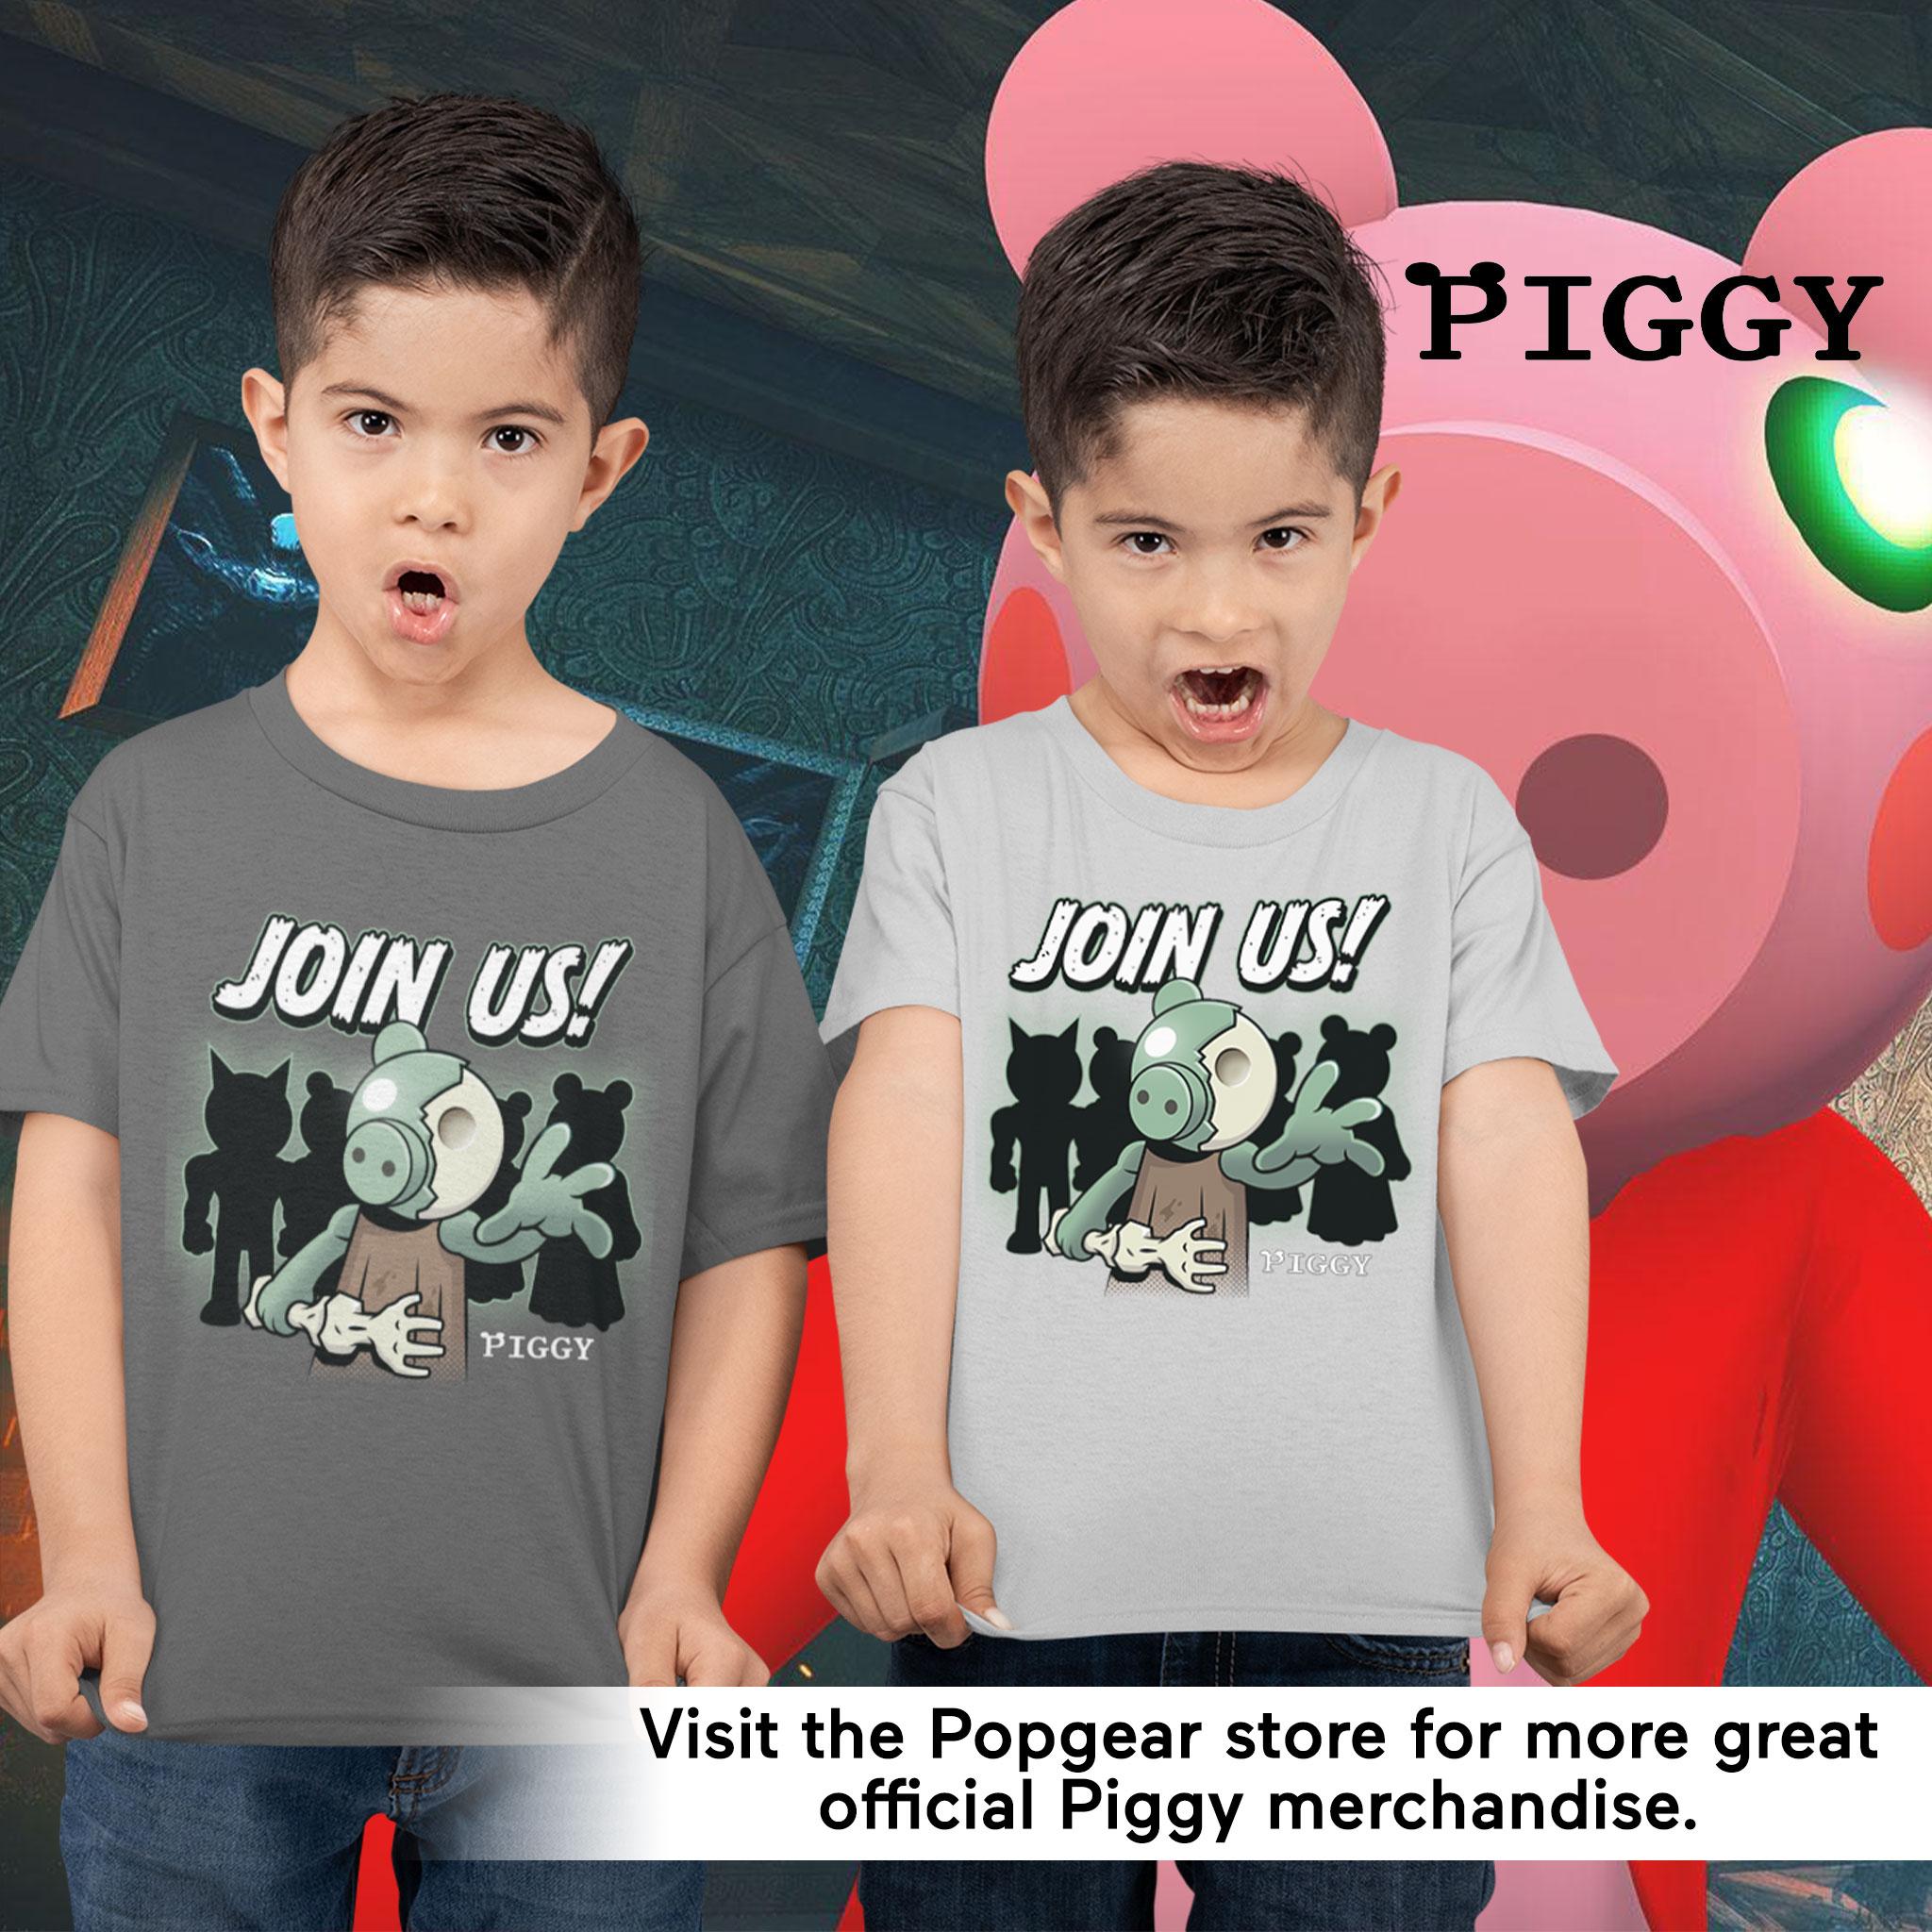 miniature 10 - Boys Piggy T Shirt Zombie Join Us Official Grey